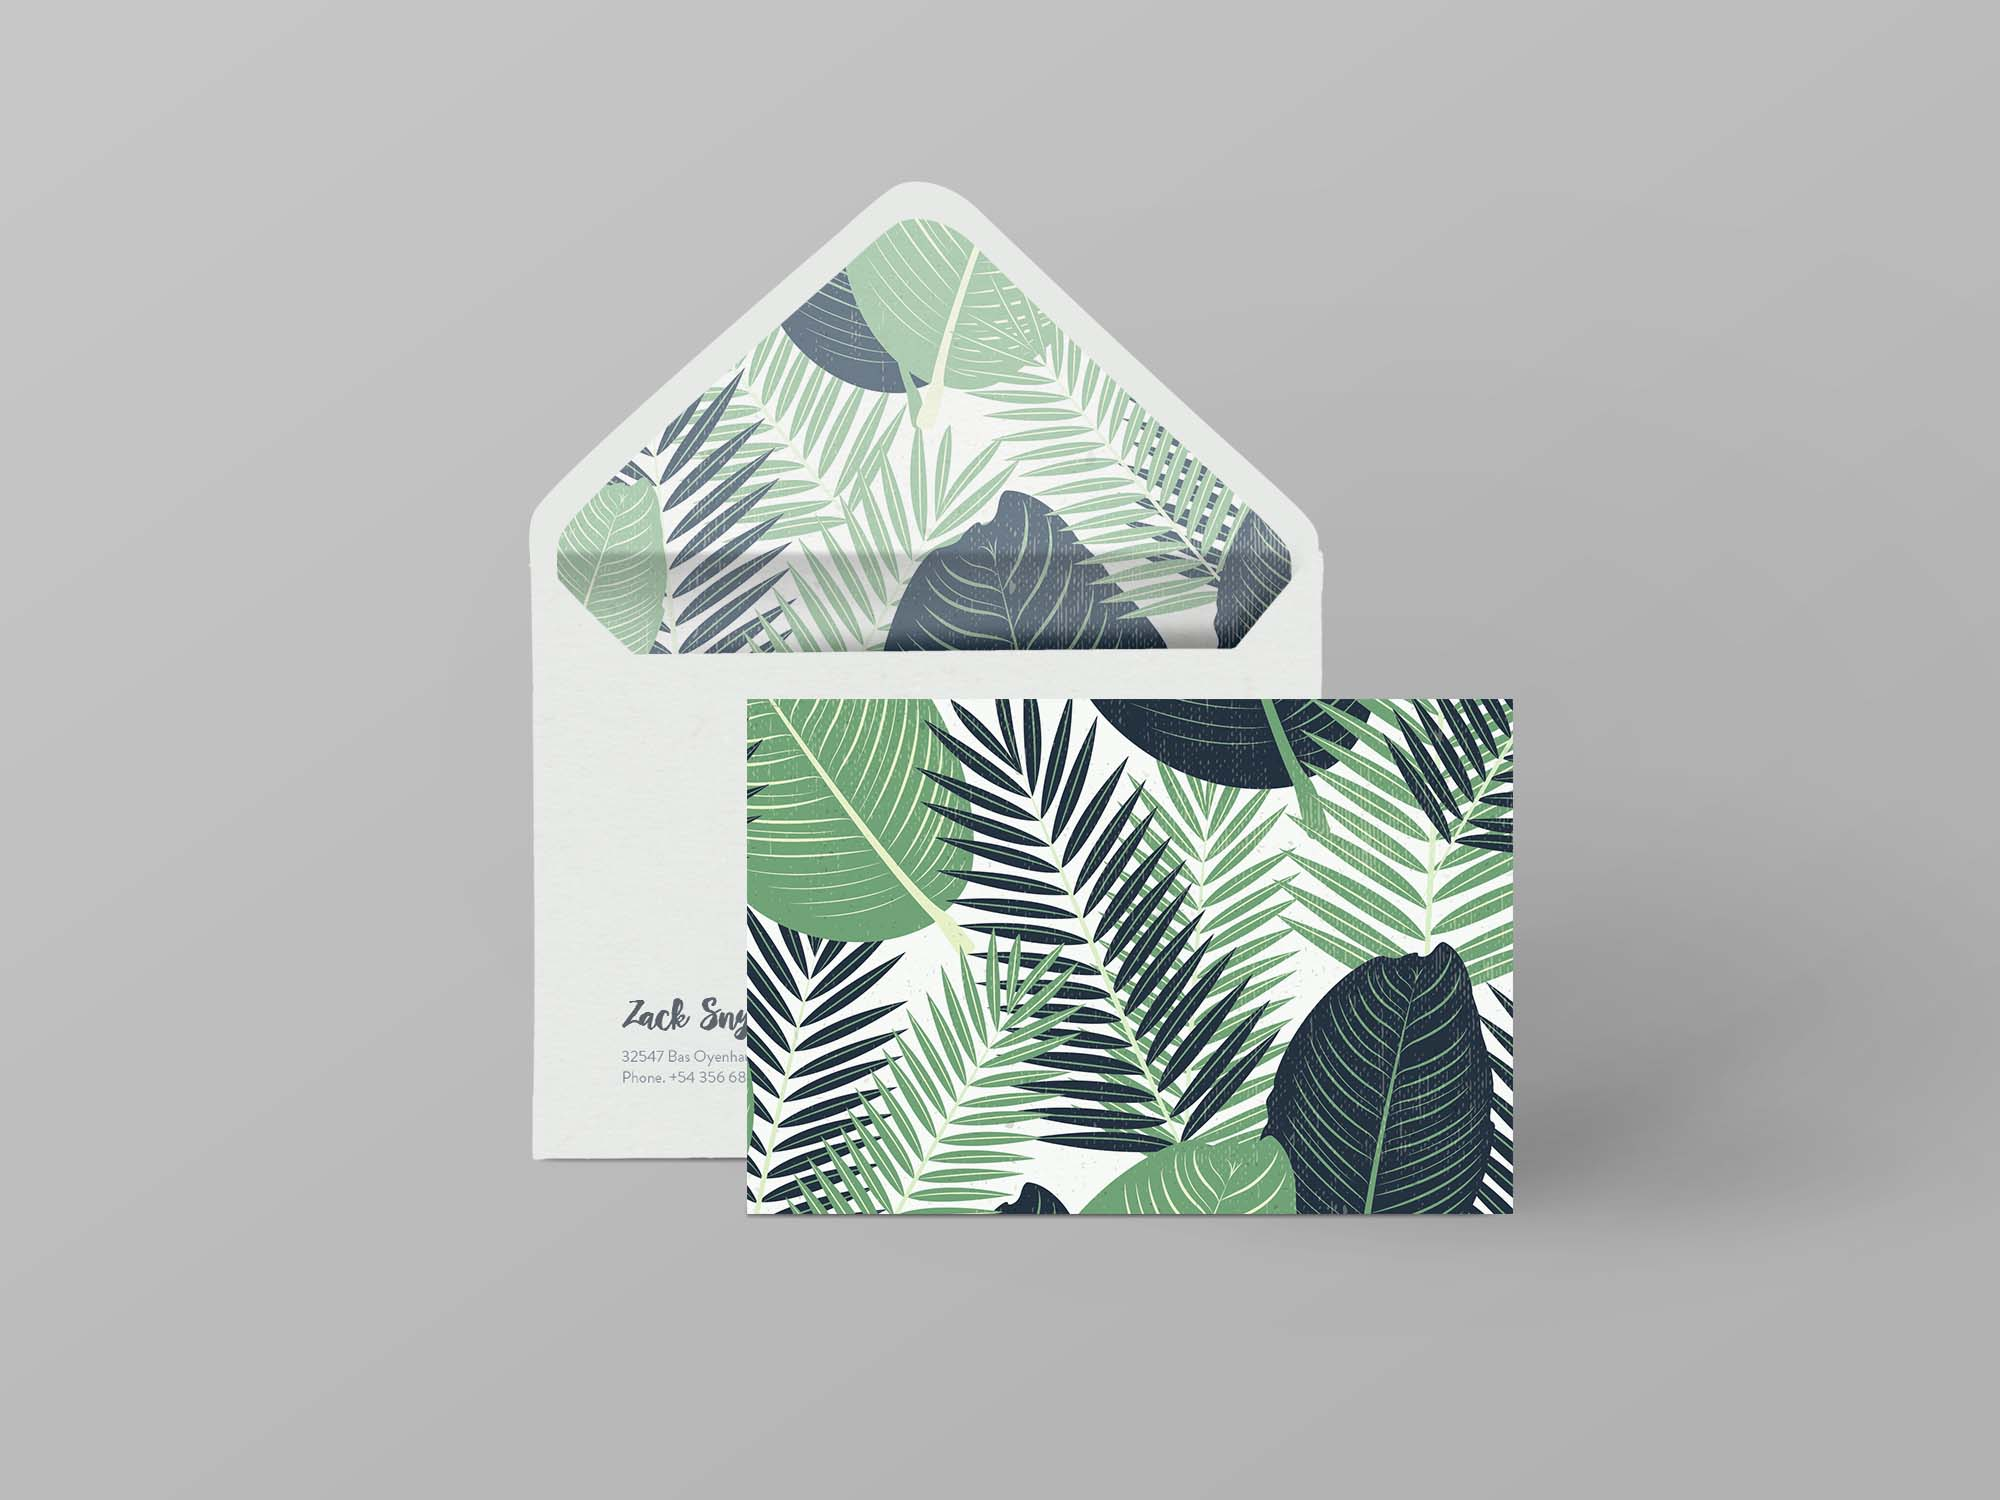 Envelope Branding Mockup